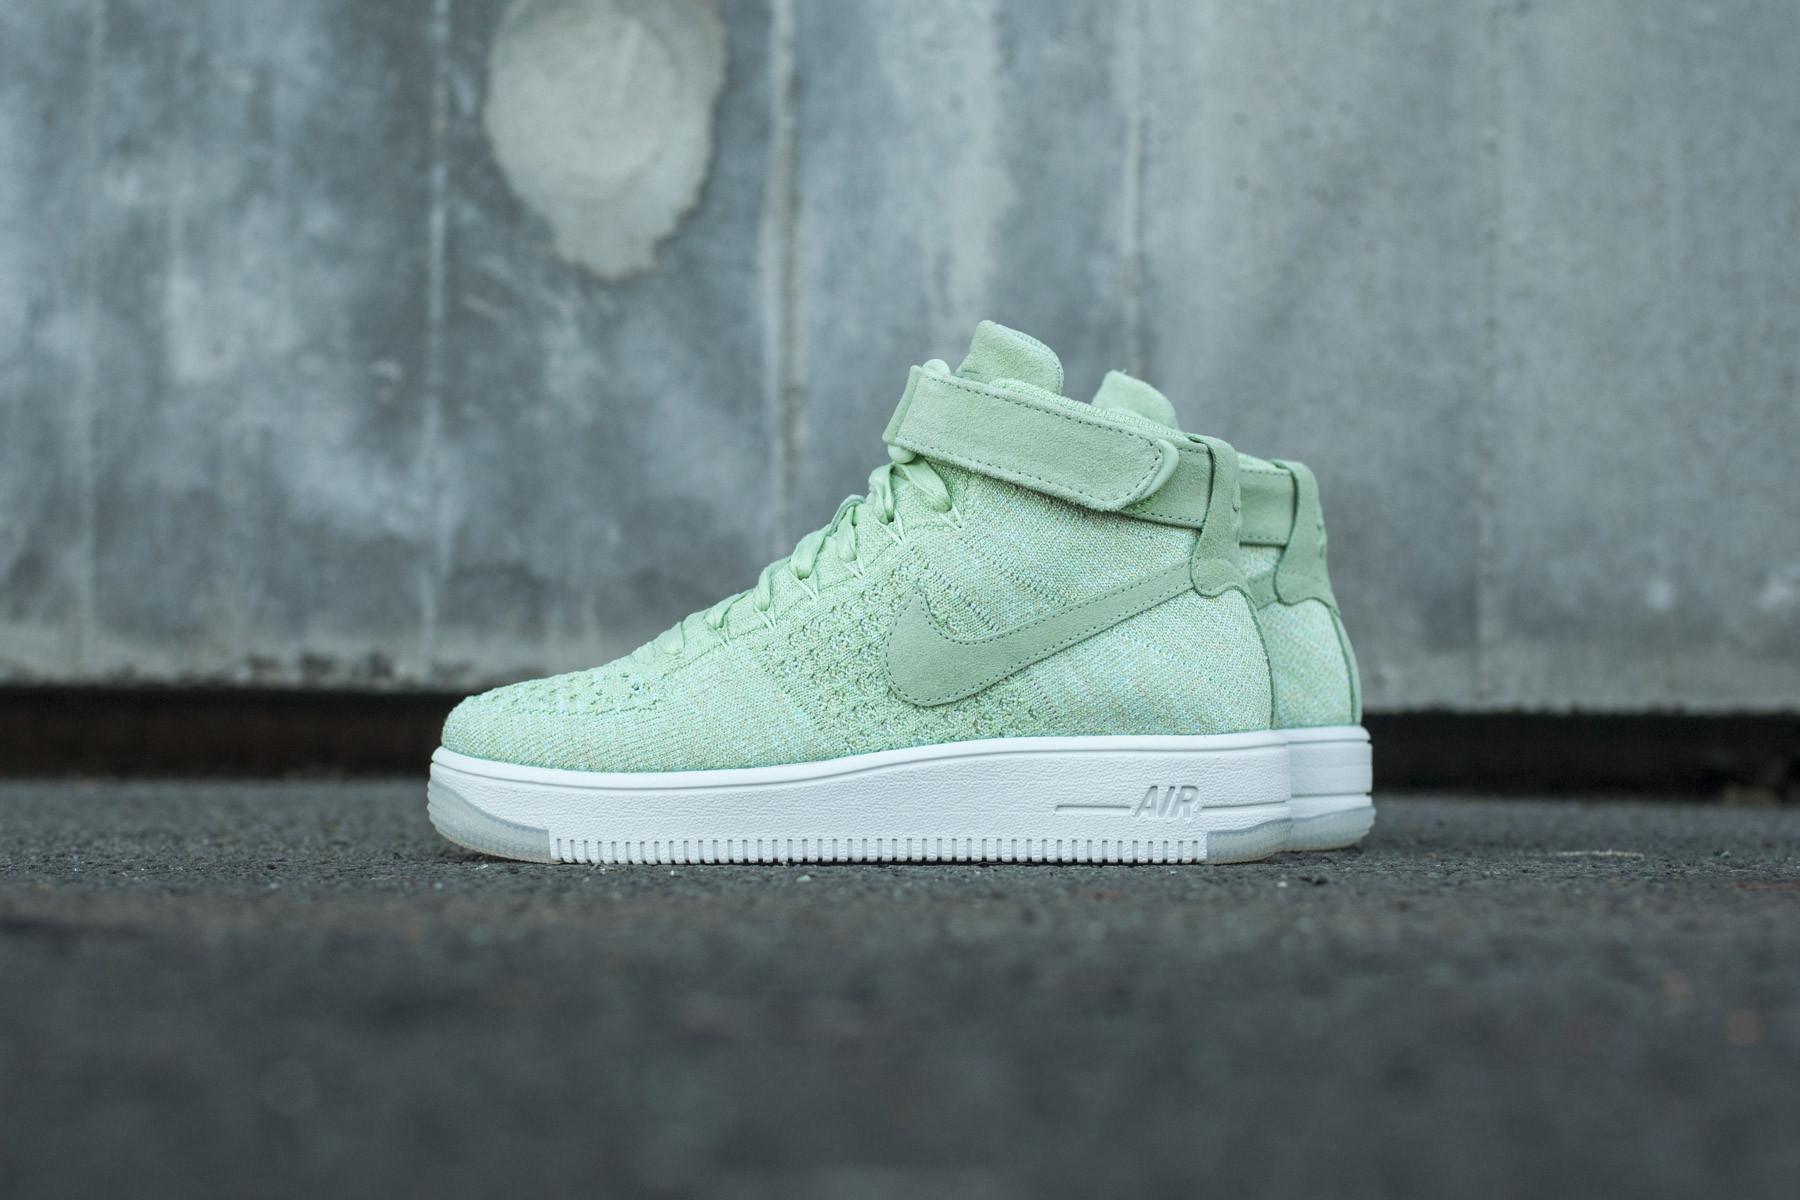 Wmns Nike AF1 Flyknit Sneaker.no